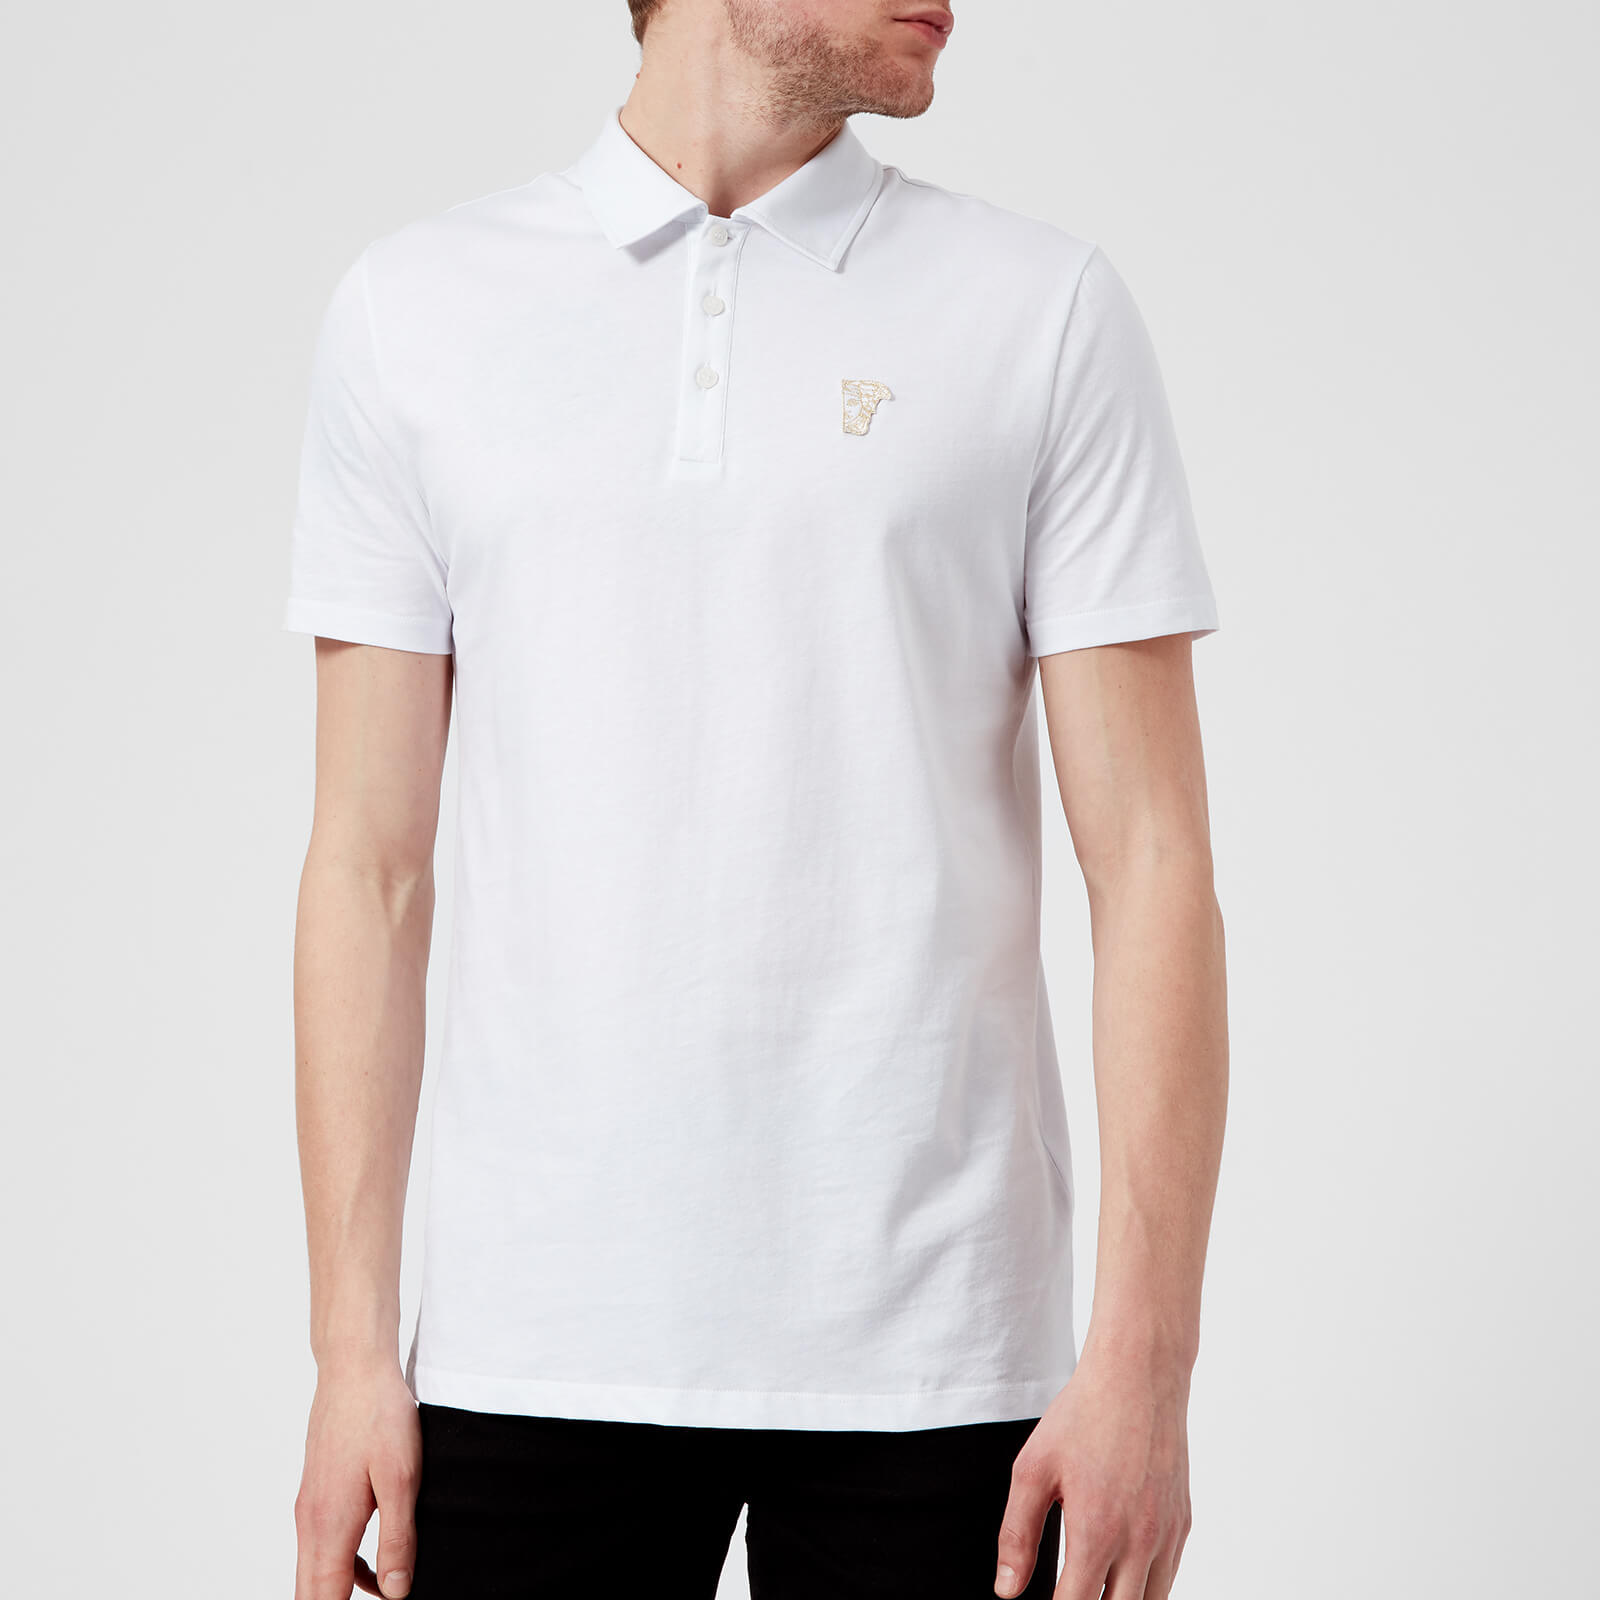 b716e4e312e17 Versace Collection Men s Basic Polo Shirt - White - Free UK Delivery over £ 50